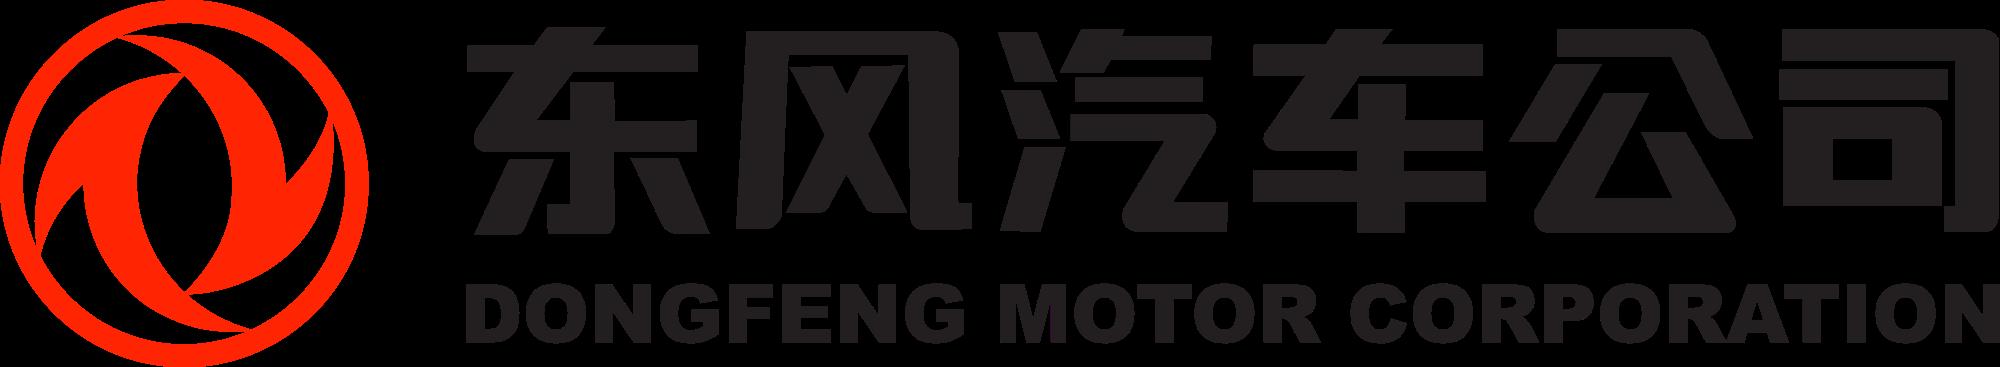 Dongfeng Motor Wuhan Open - Dongfeng PNG